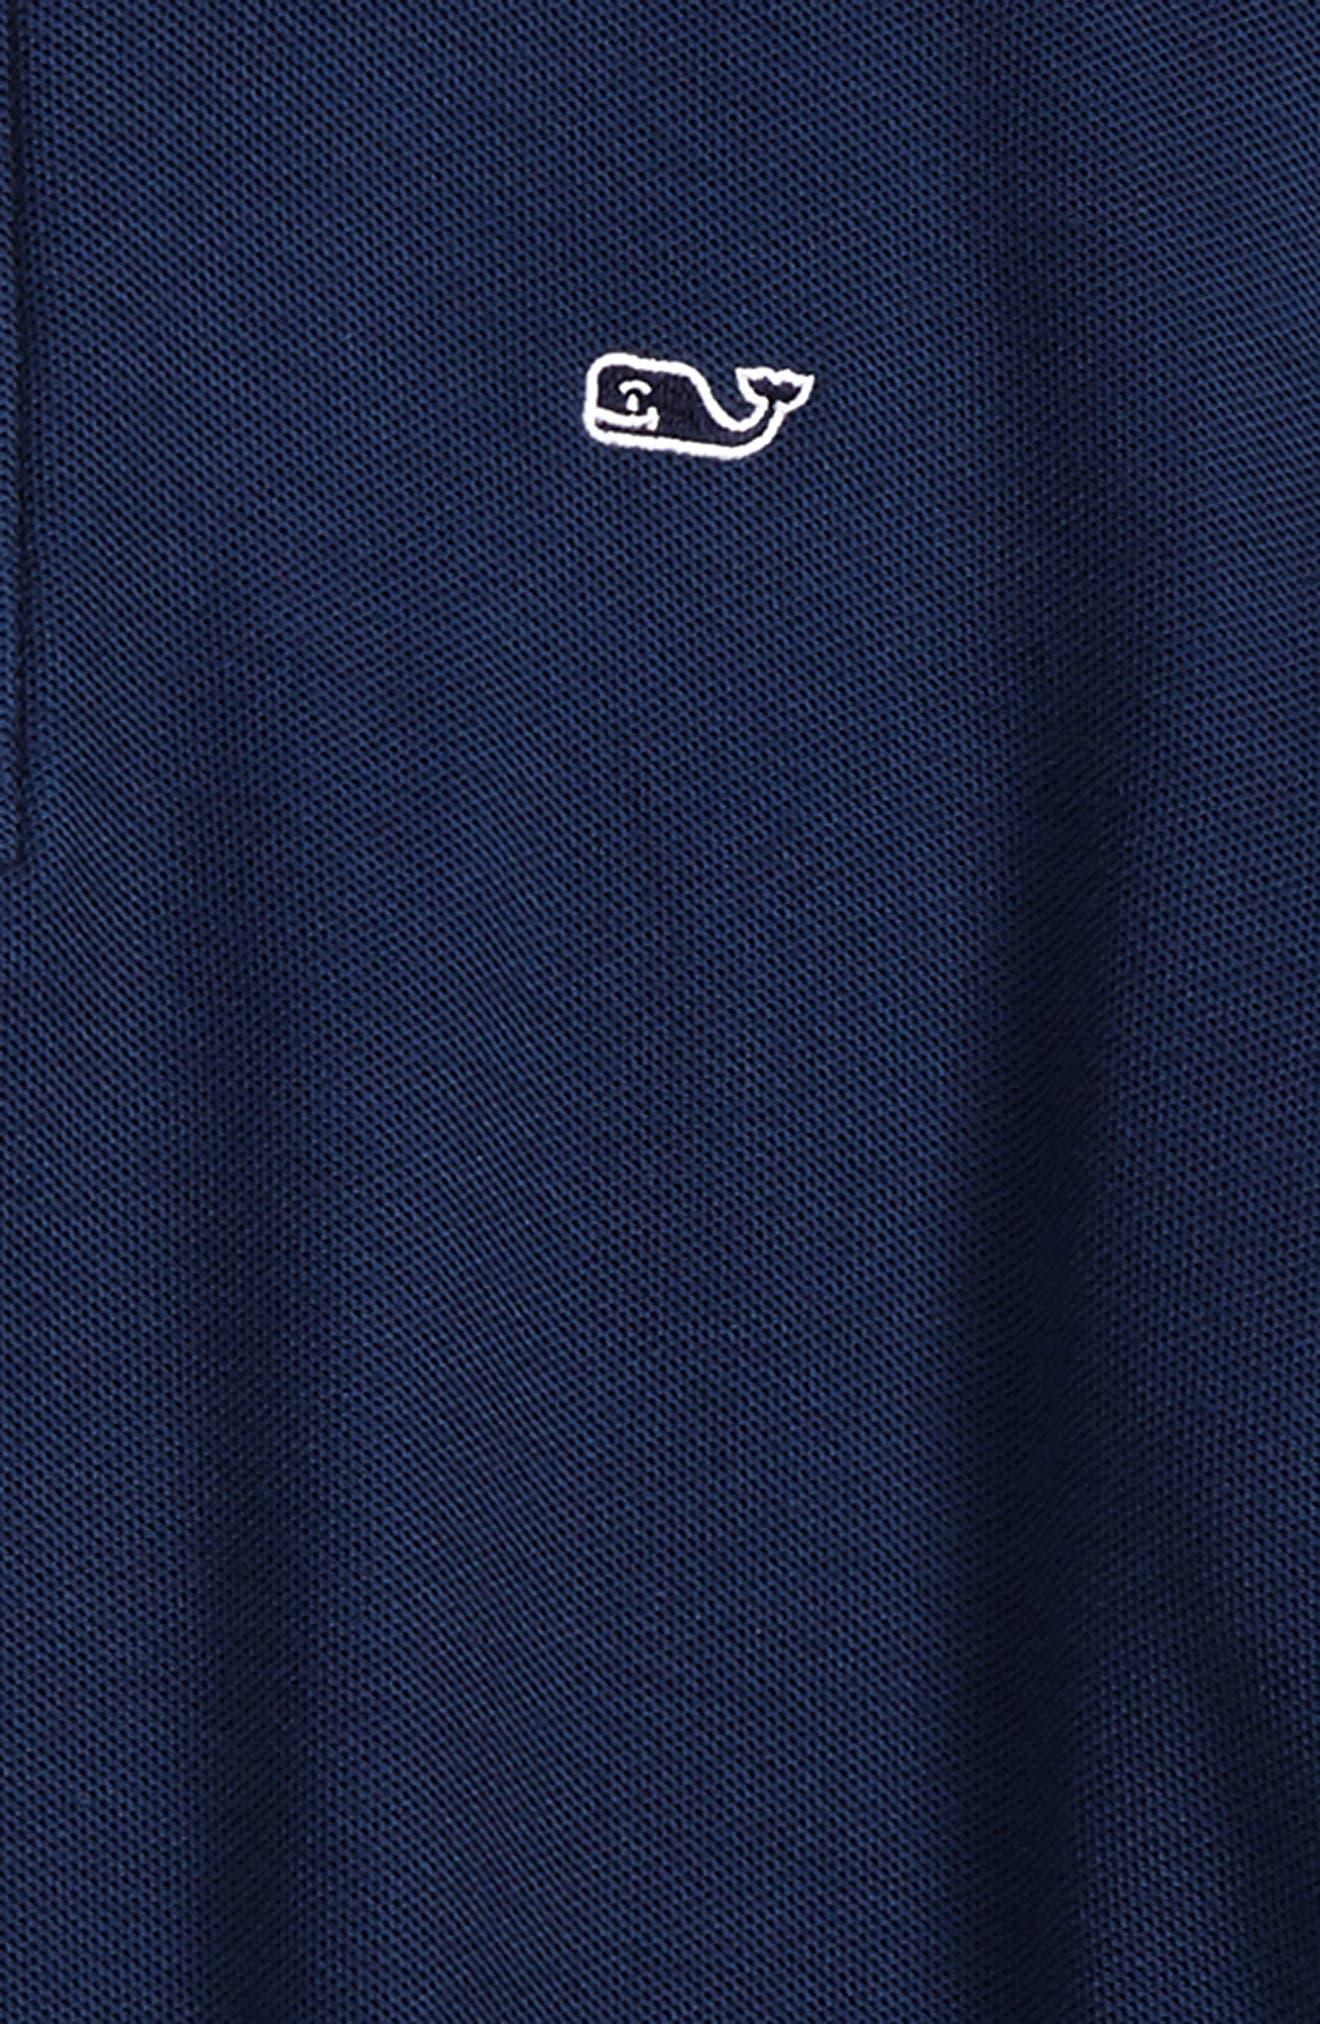 Quarter Zip Pullover,                             Alternate thumbnail 2, color,                             VINEYARD NAVY